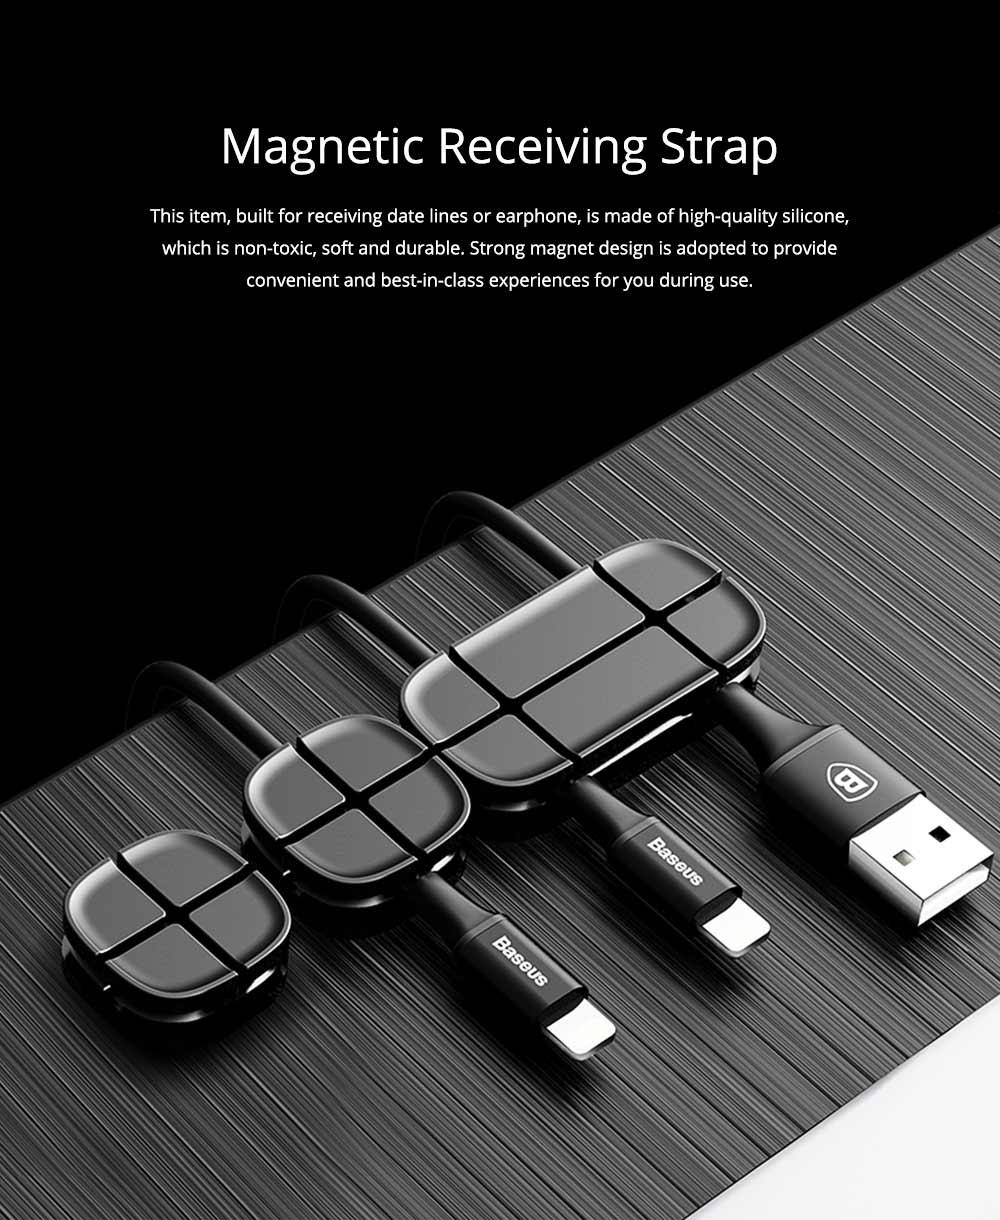 Ultrasoft Silicone Cross Cruciform Model Wire Data Line Earphone Organizer, Flexible Desktop Wire Holder Clamp Management 10